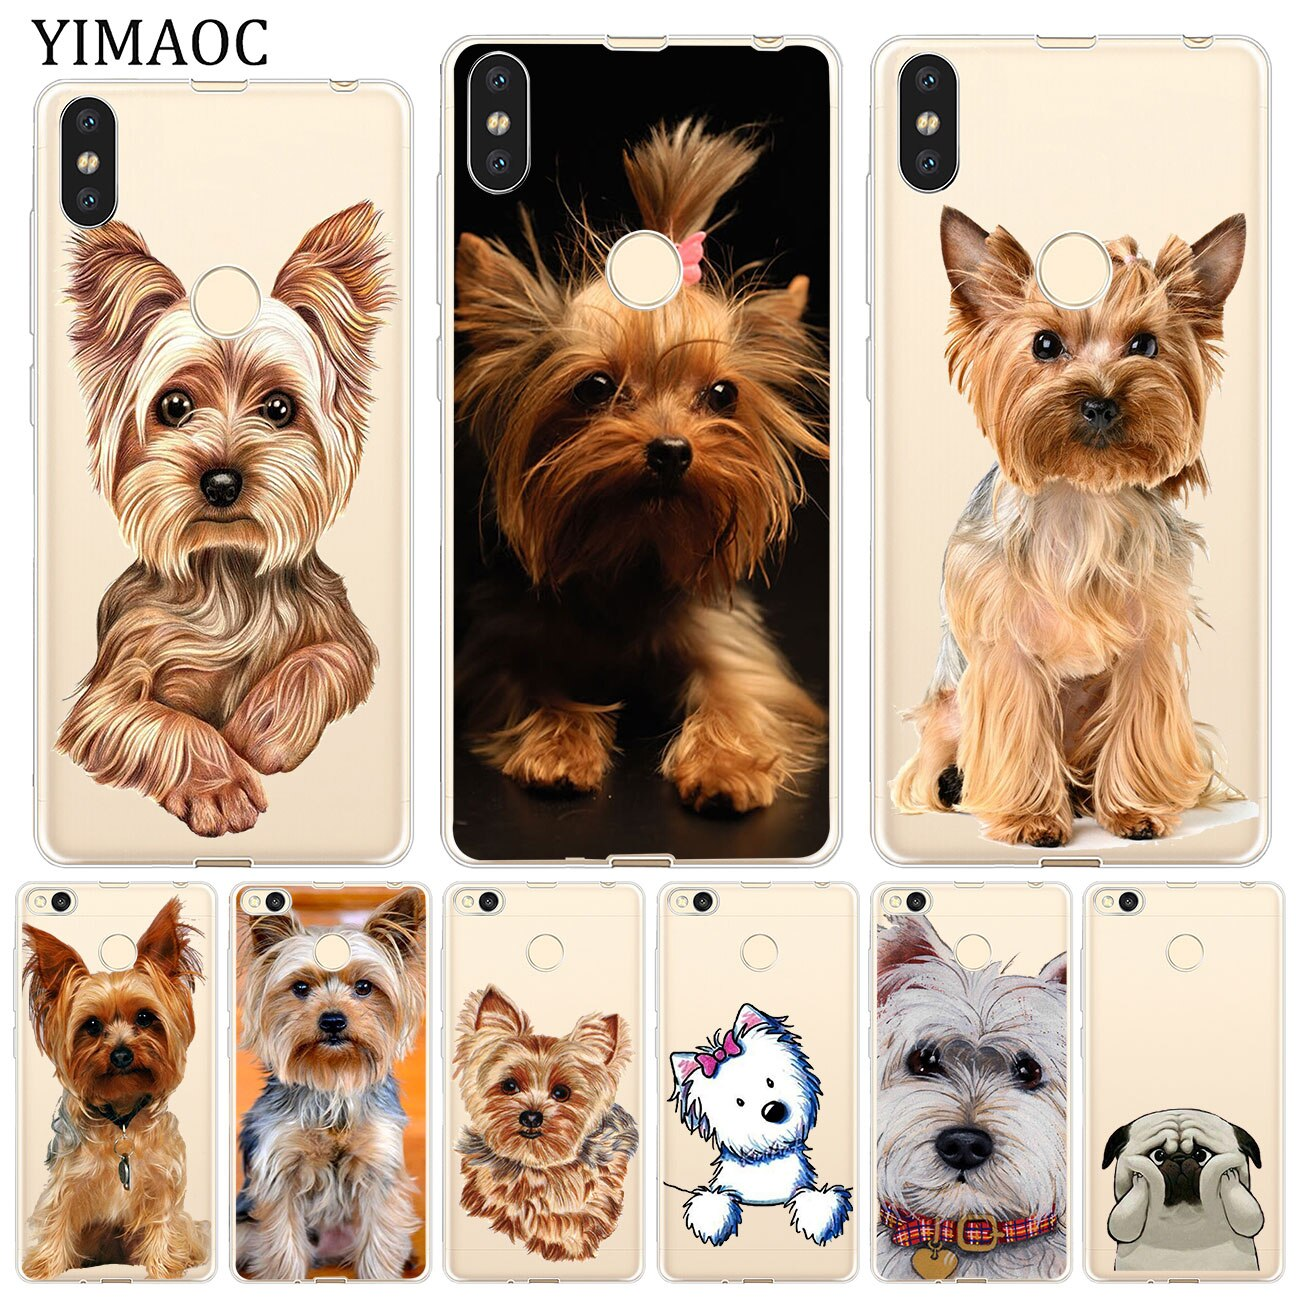 YIMAOC yorkshire terrier dog puppy Soft Case for Xiaomi Mi 9 9T CC9 CC9E A3 Pro 8 SE A2 Lite A1 MiX